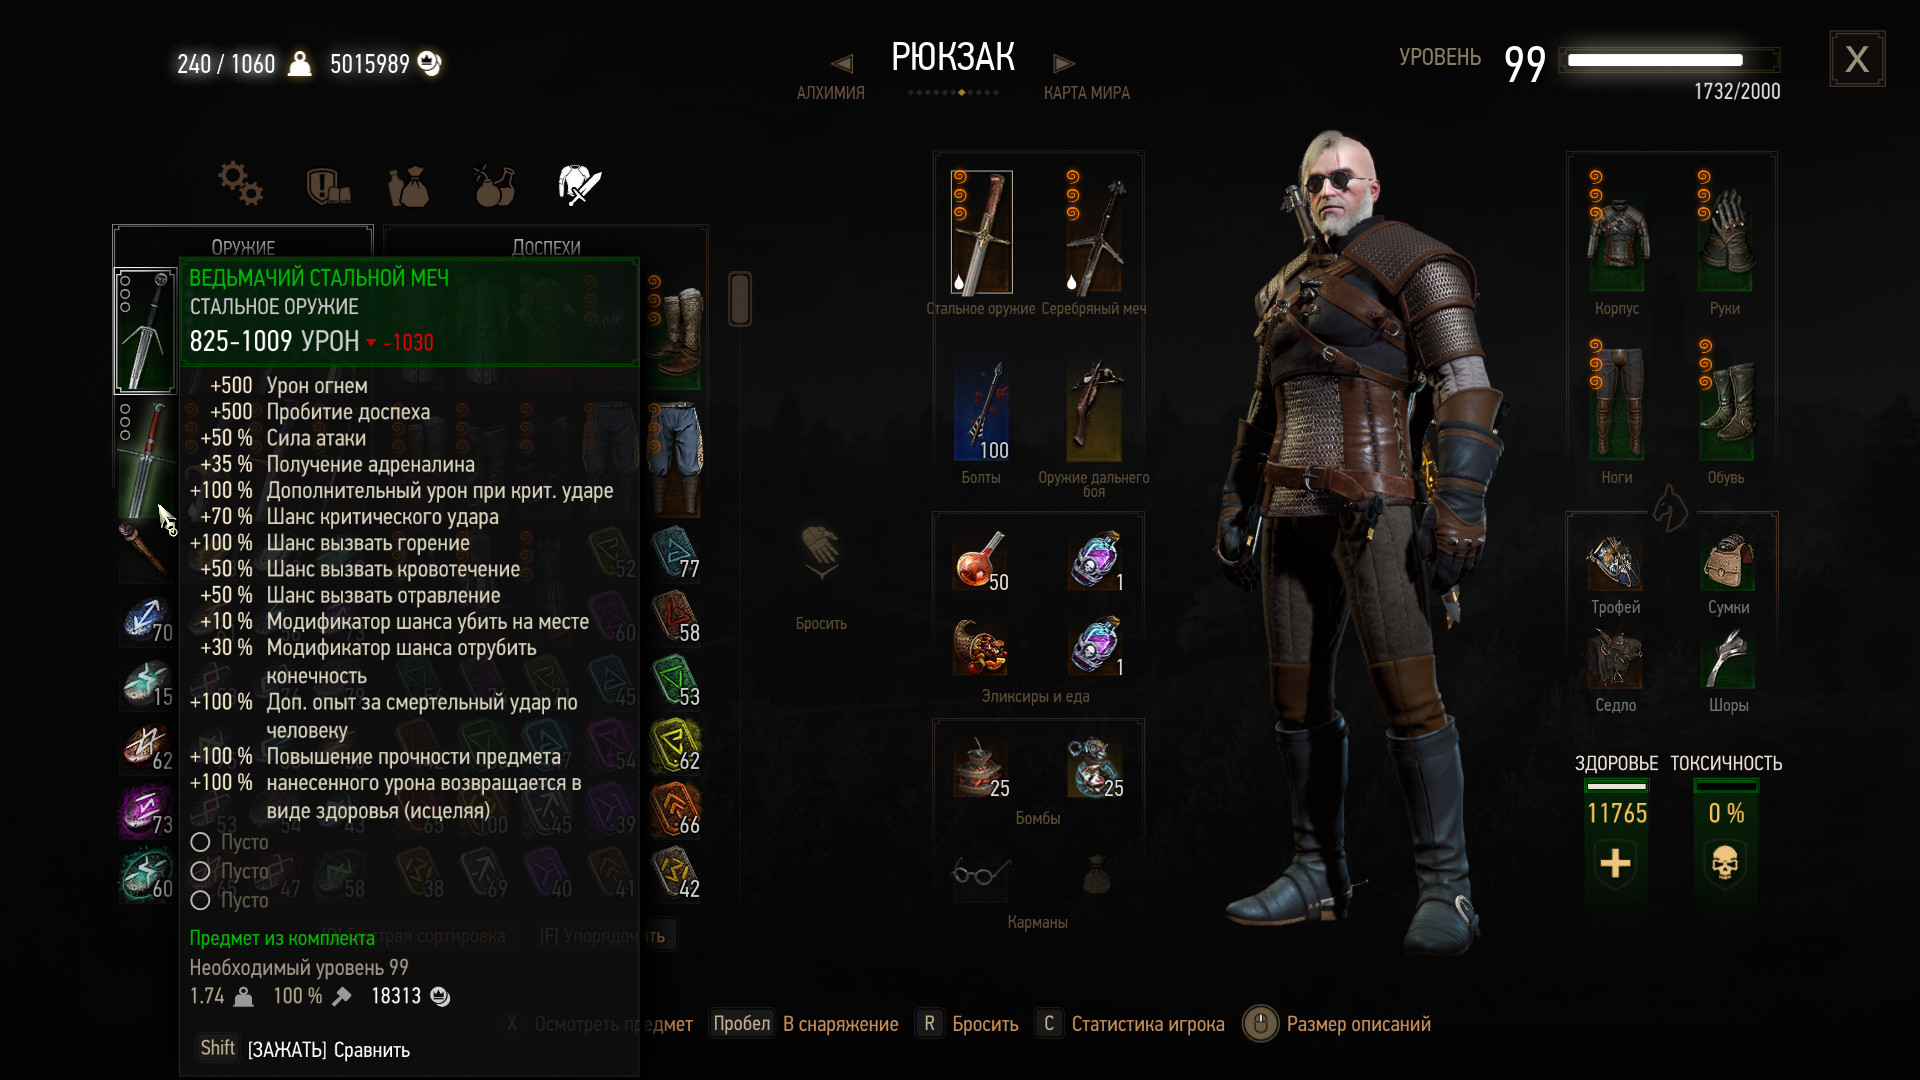 СБТ2.jpg - Witcher 3: Wild Hunt, the